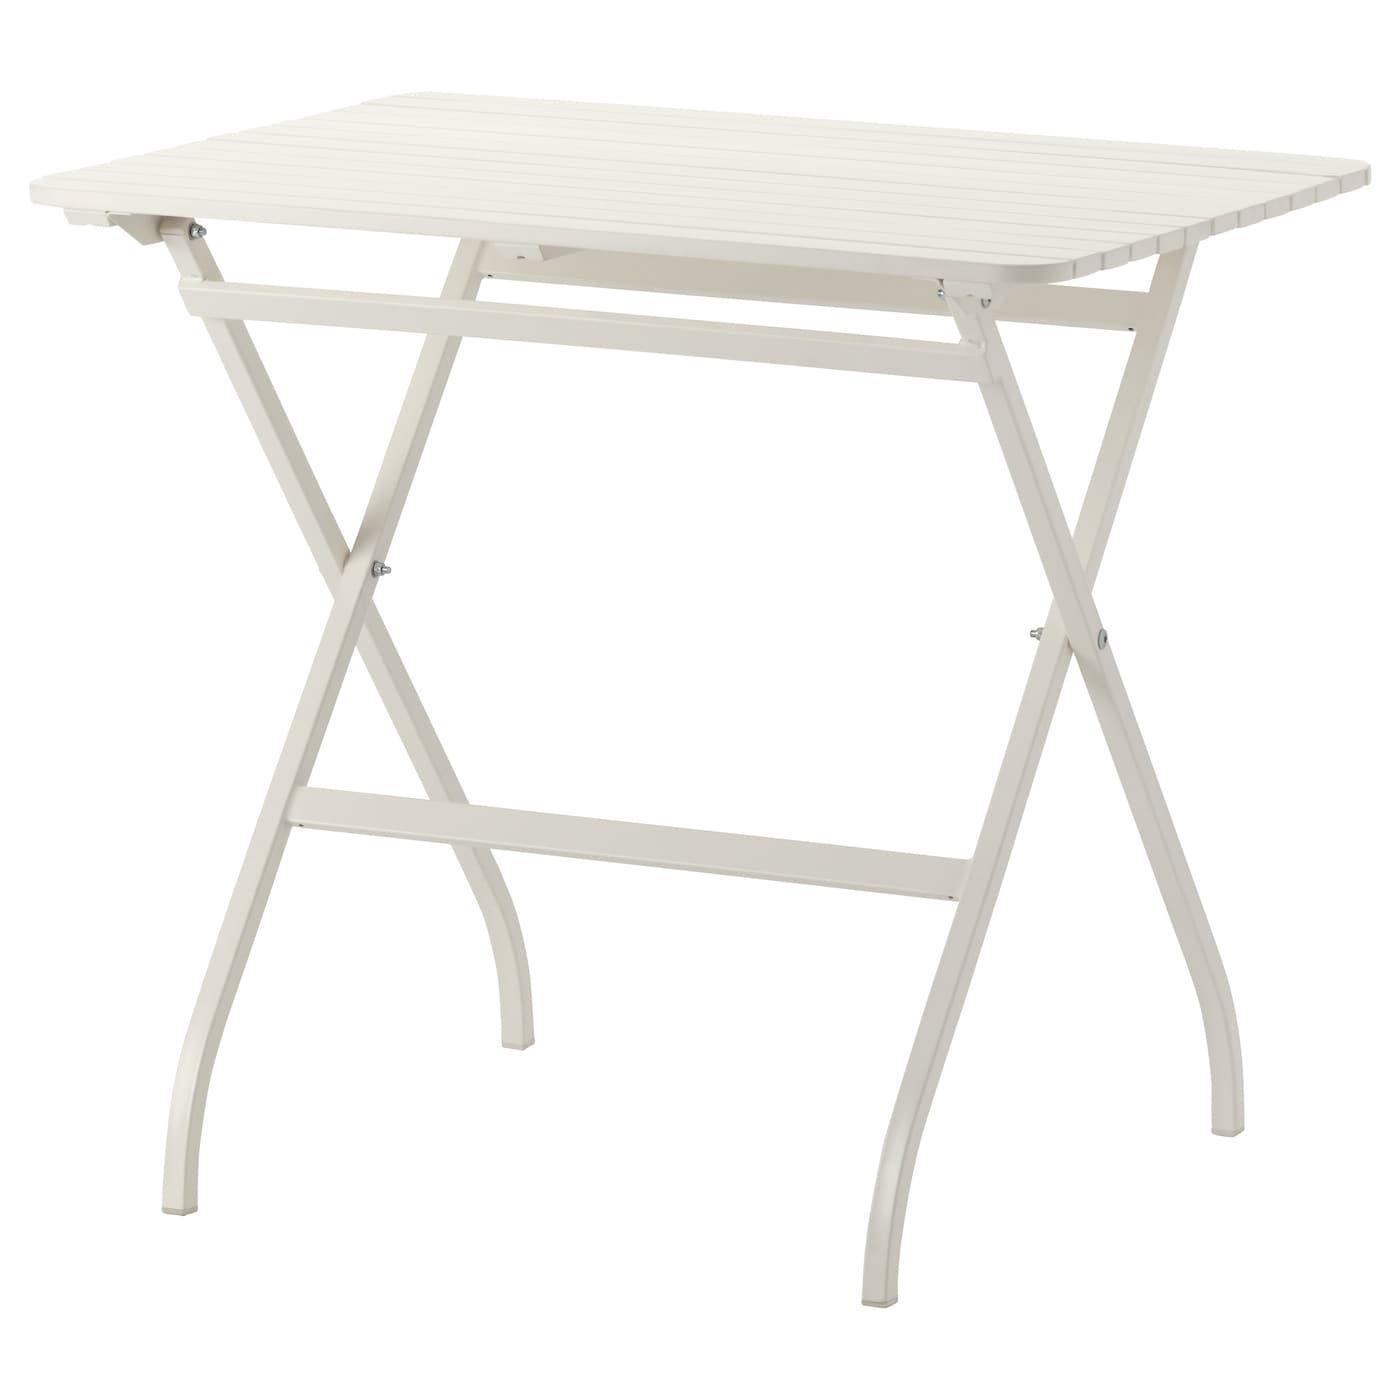 Malaro Table Outdoor Foldable White 80x62 Cm Ikea Kleiner Gartentisch Ikea Outdoor Gartenmobel